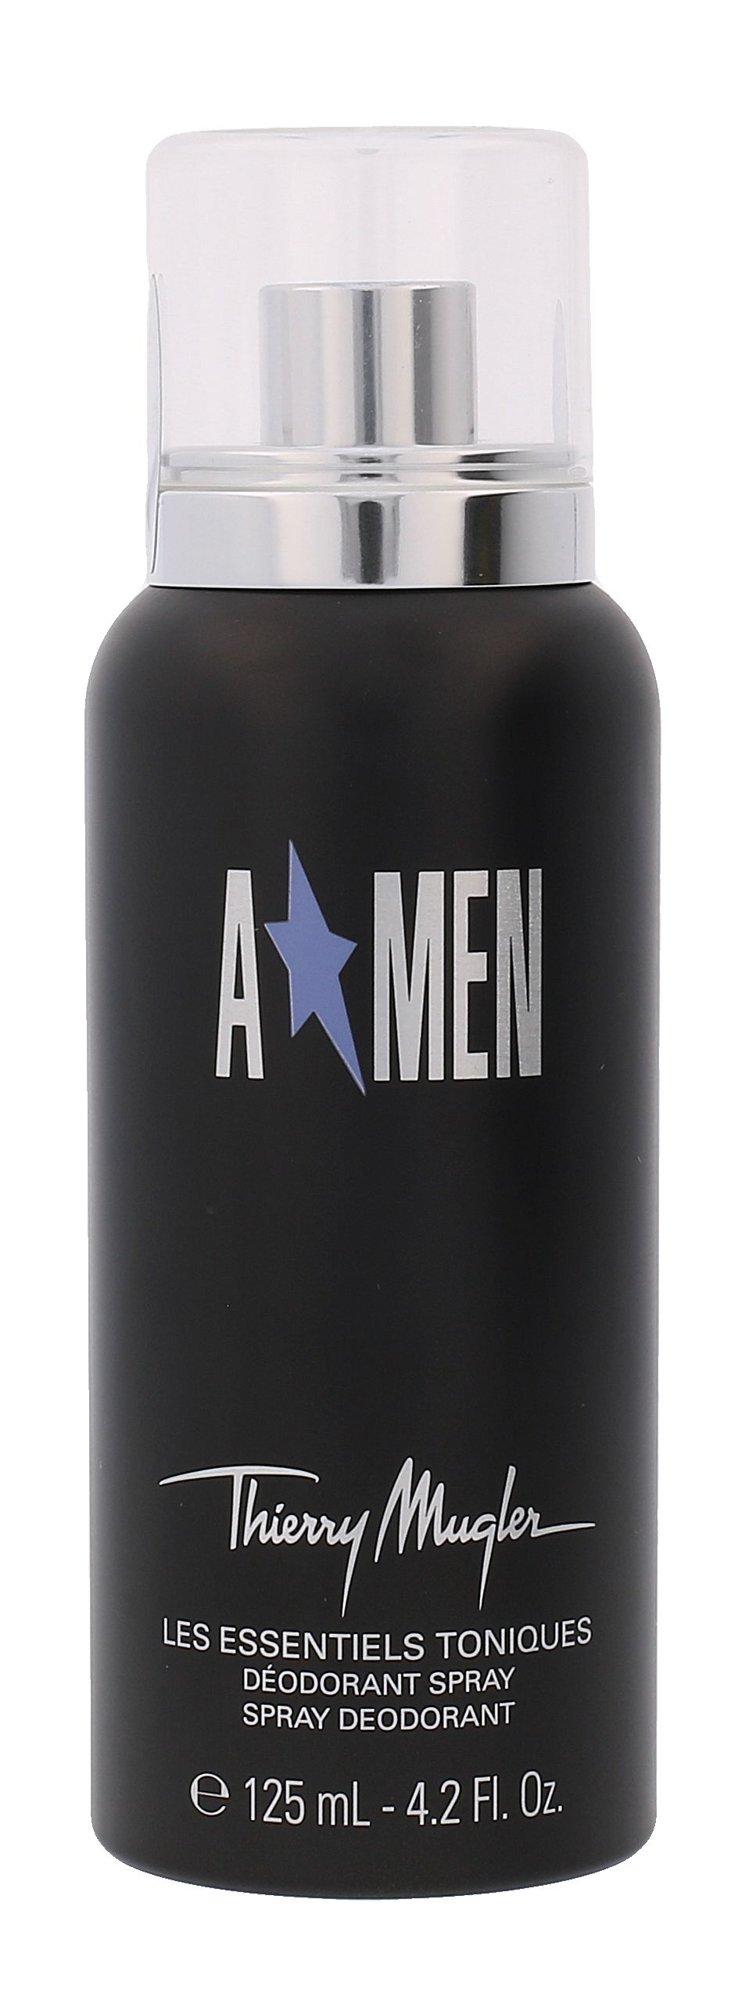 Thierry Mugler A*Men Deodorant 125ml